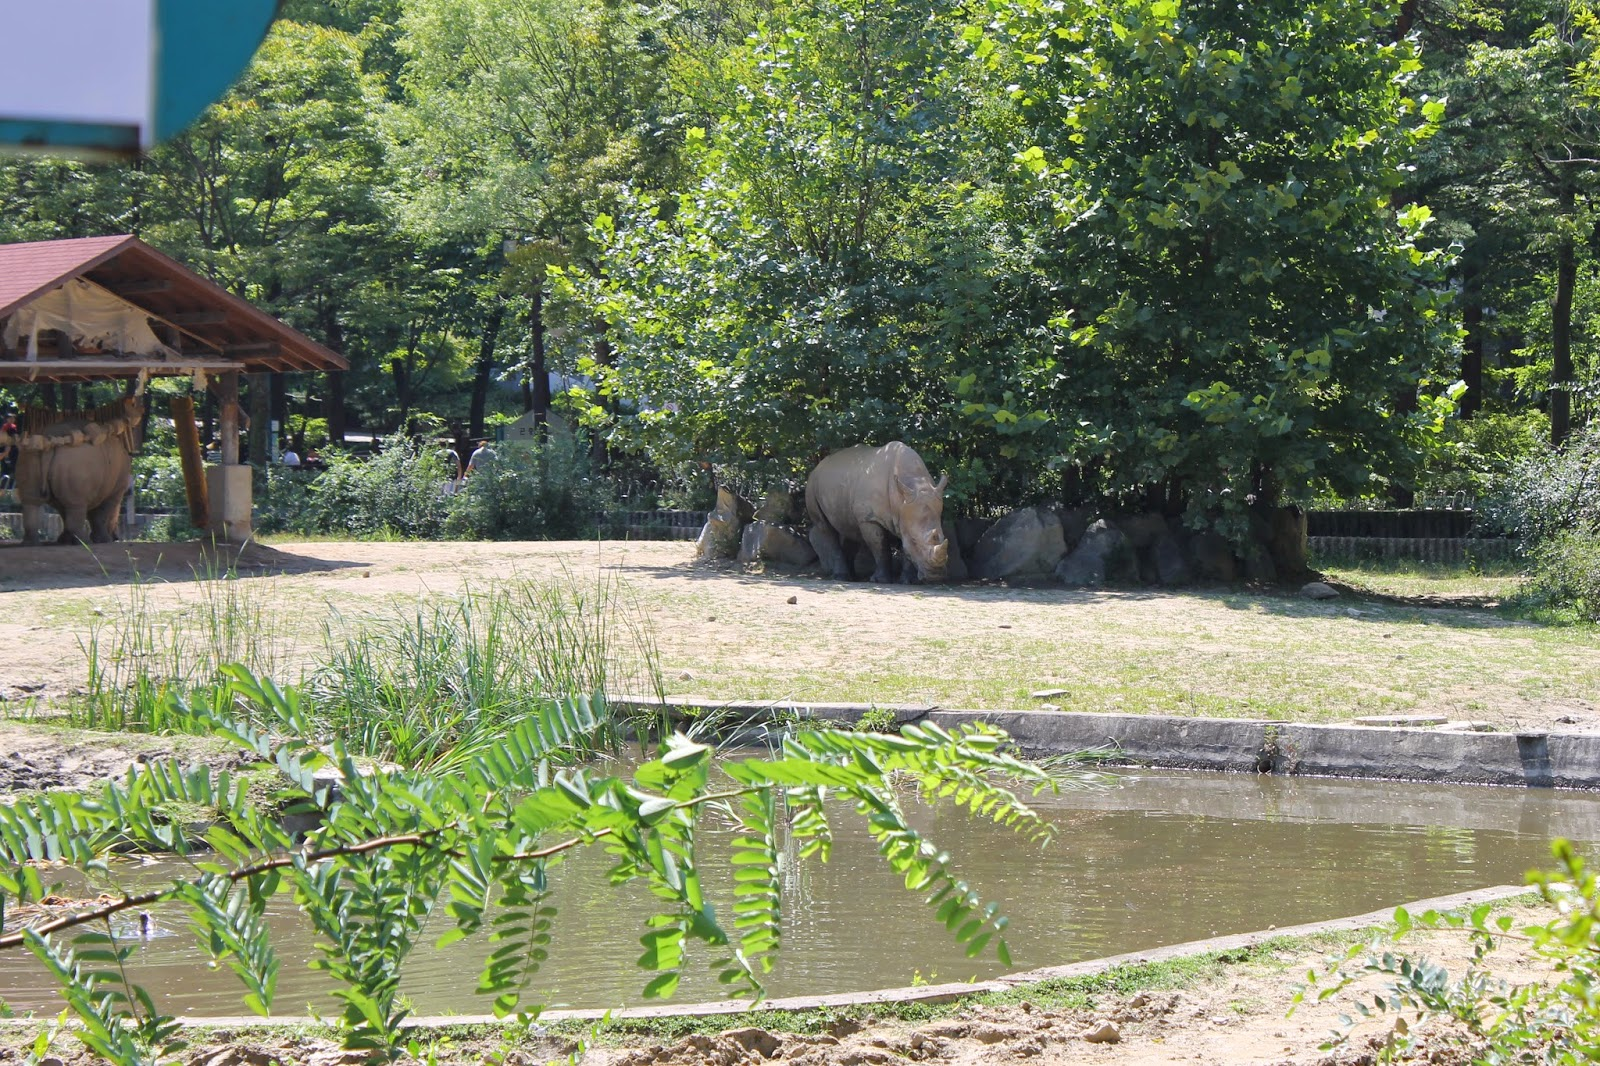 Seoul Zoo, Seoul, зоопарк в сеуле, сеул, корея, зоопарк, носорог